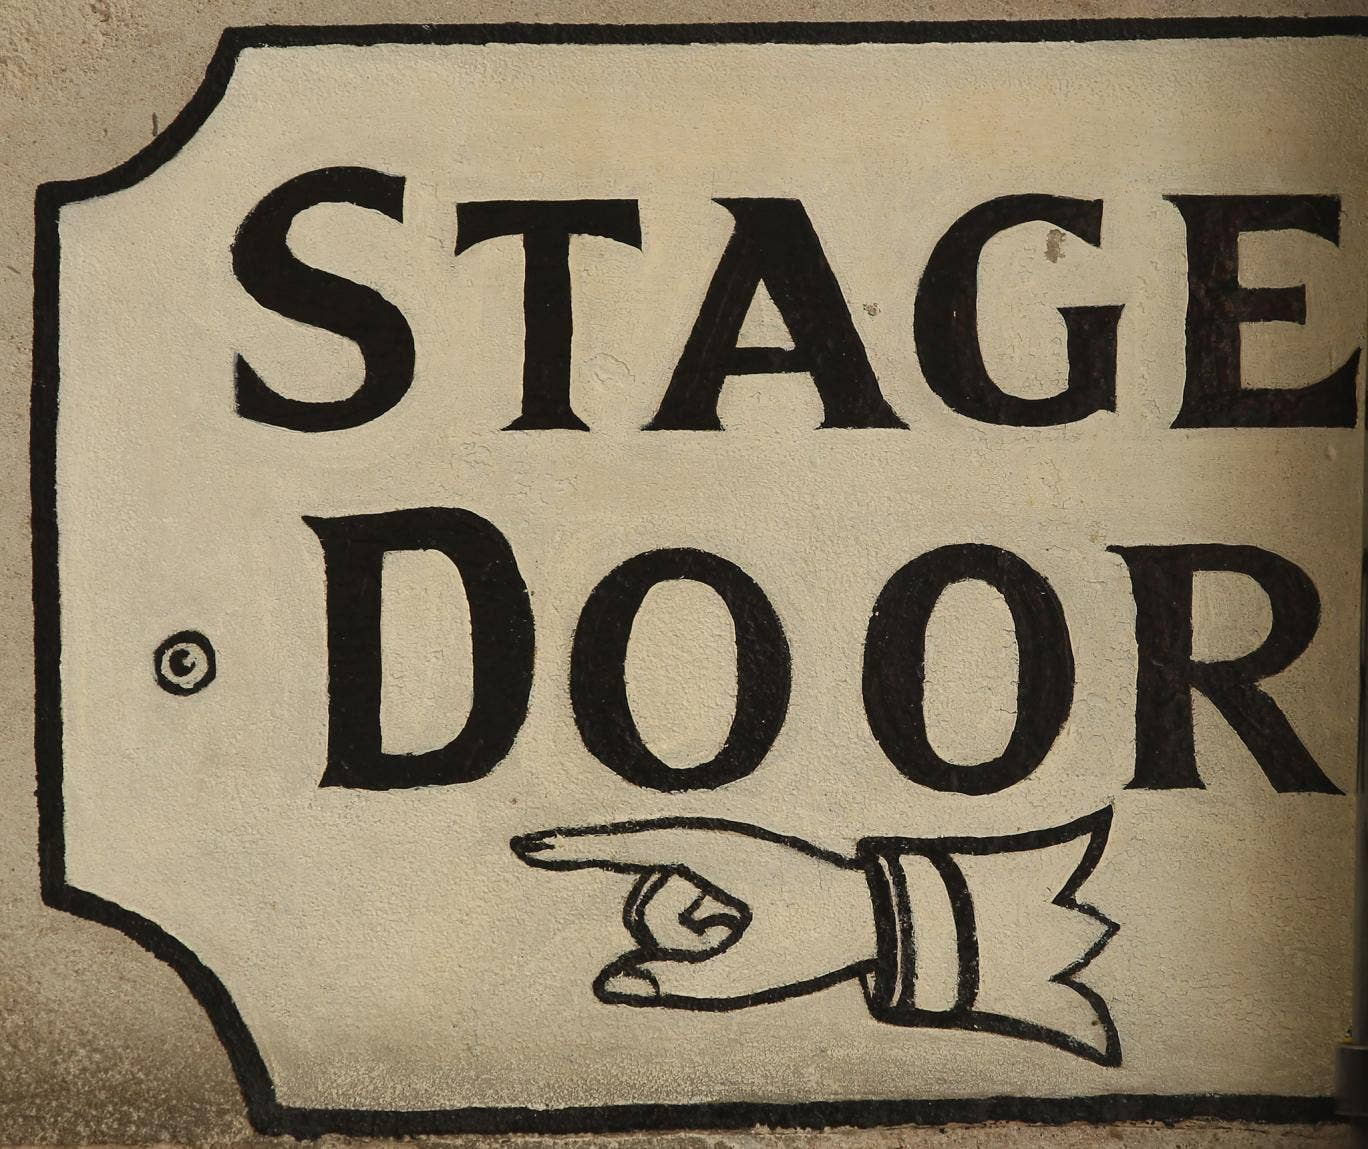 Fringe London theatres face increasing economic pressure despite a flourishing West End